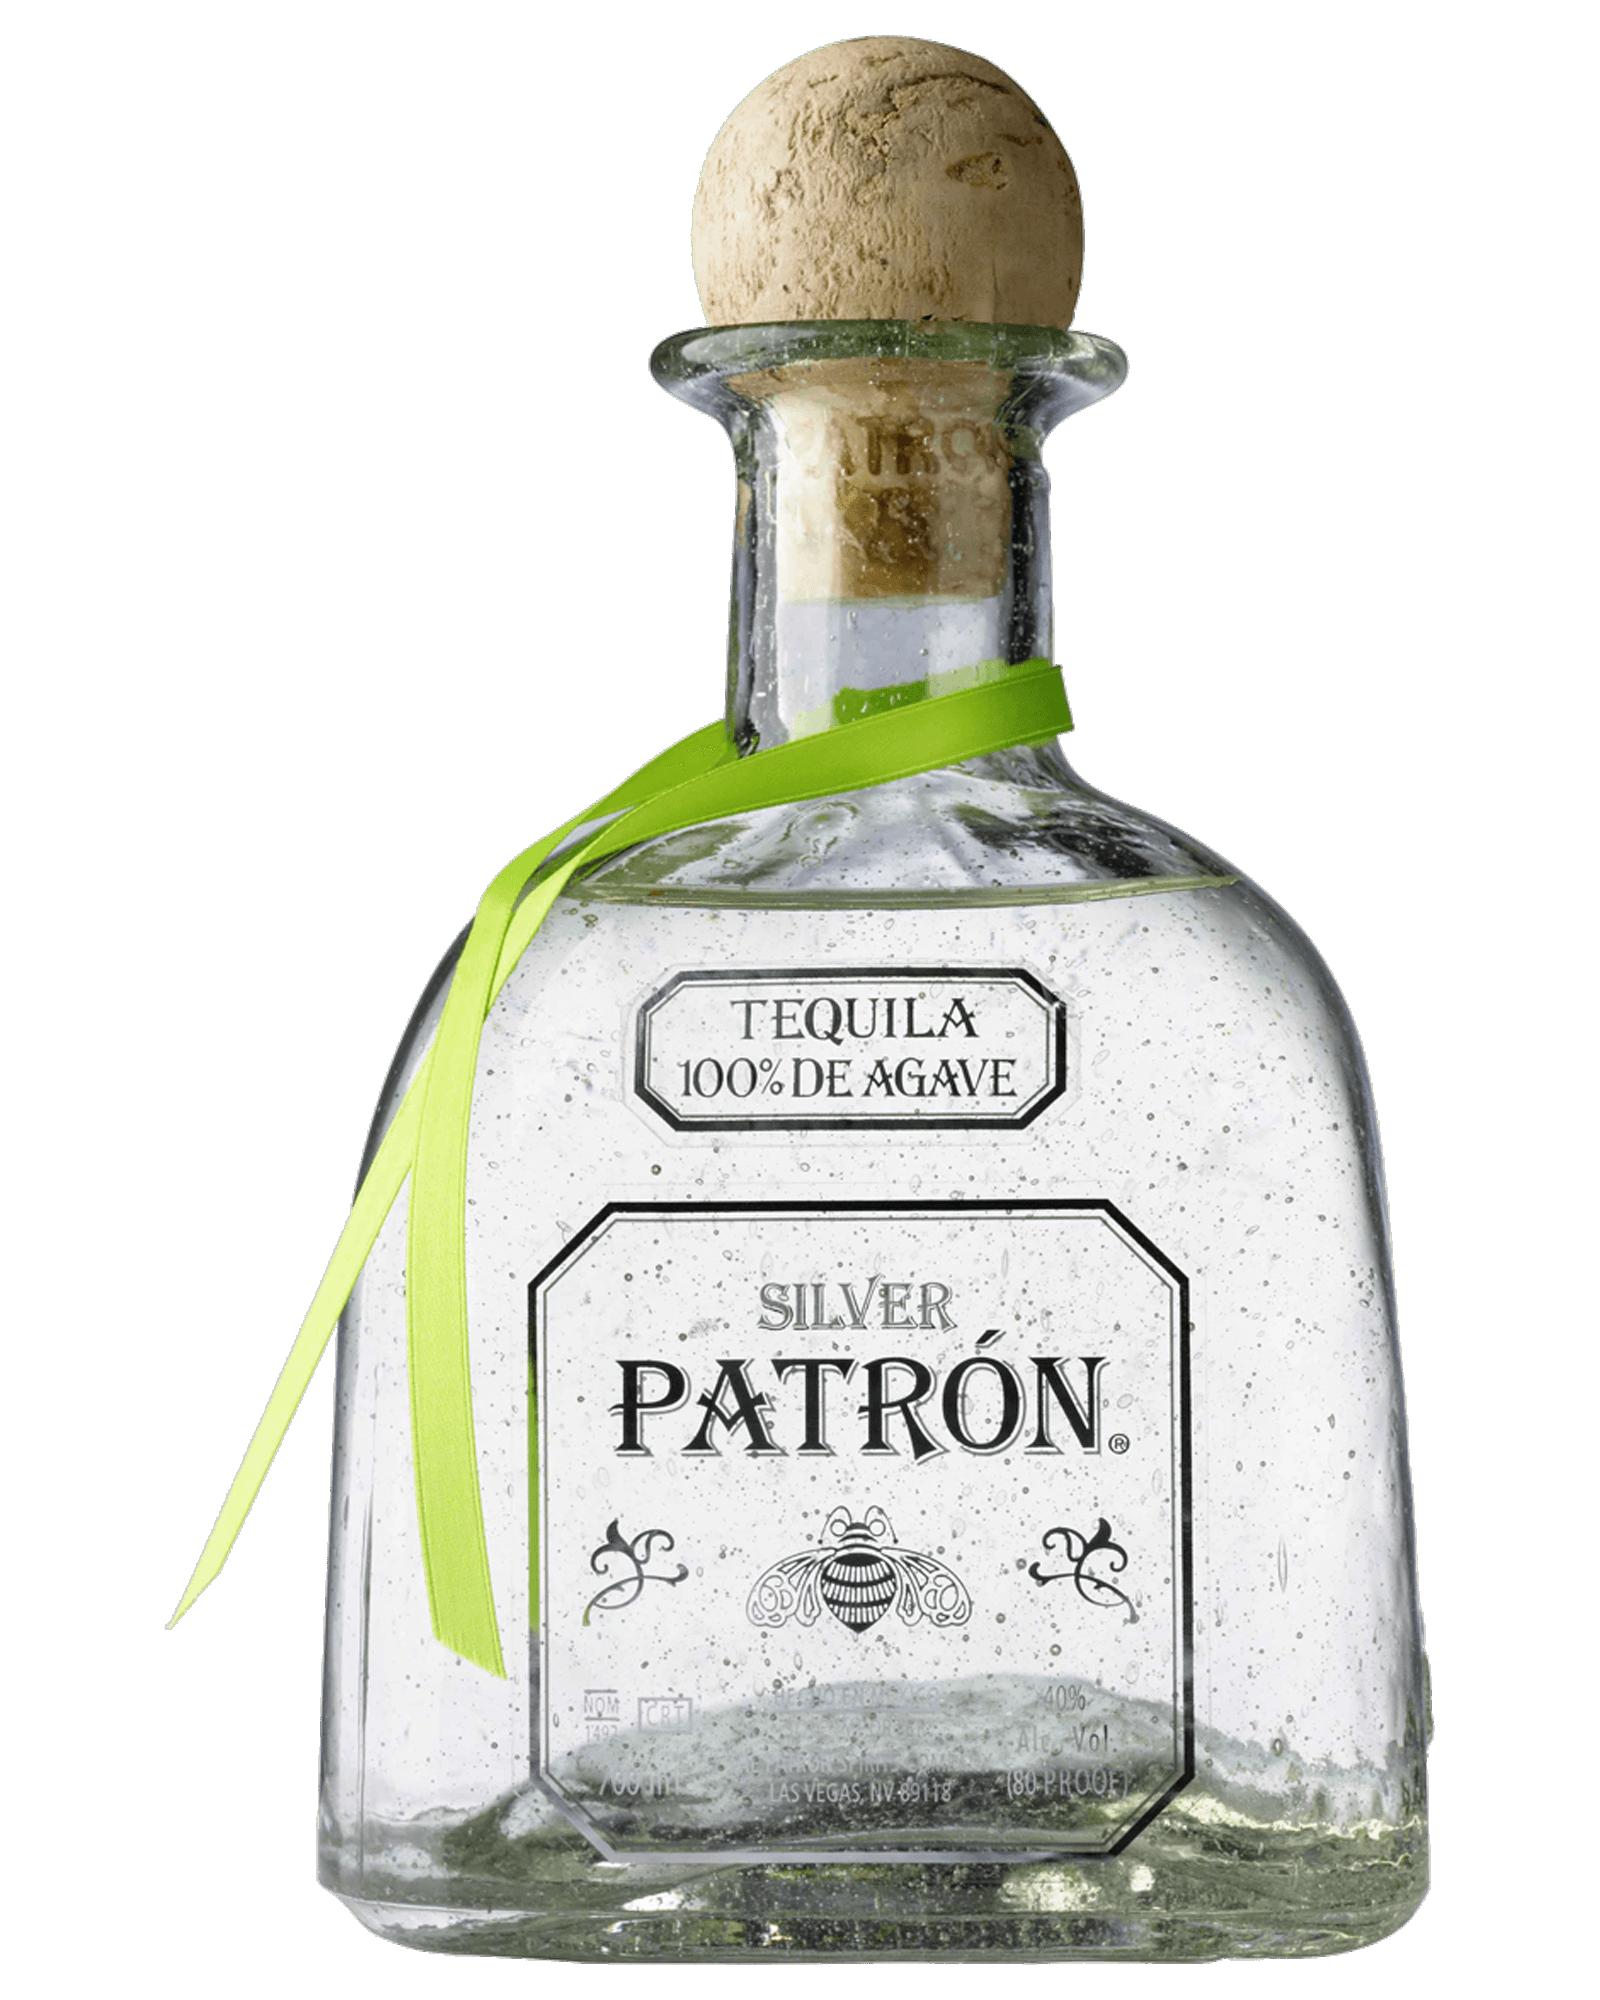 Patron Silver Tequila 700ml 700ml Patron Silver Tequila Patron Tequila Patron Silver Tequila Tequila Reviews